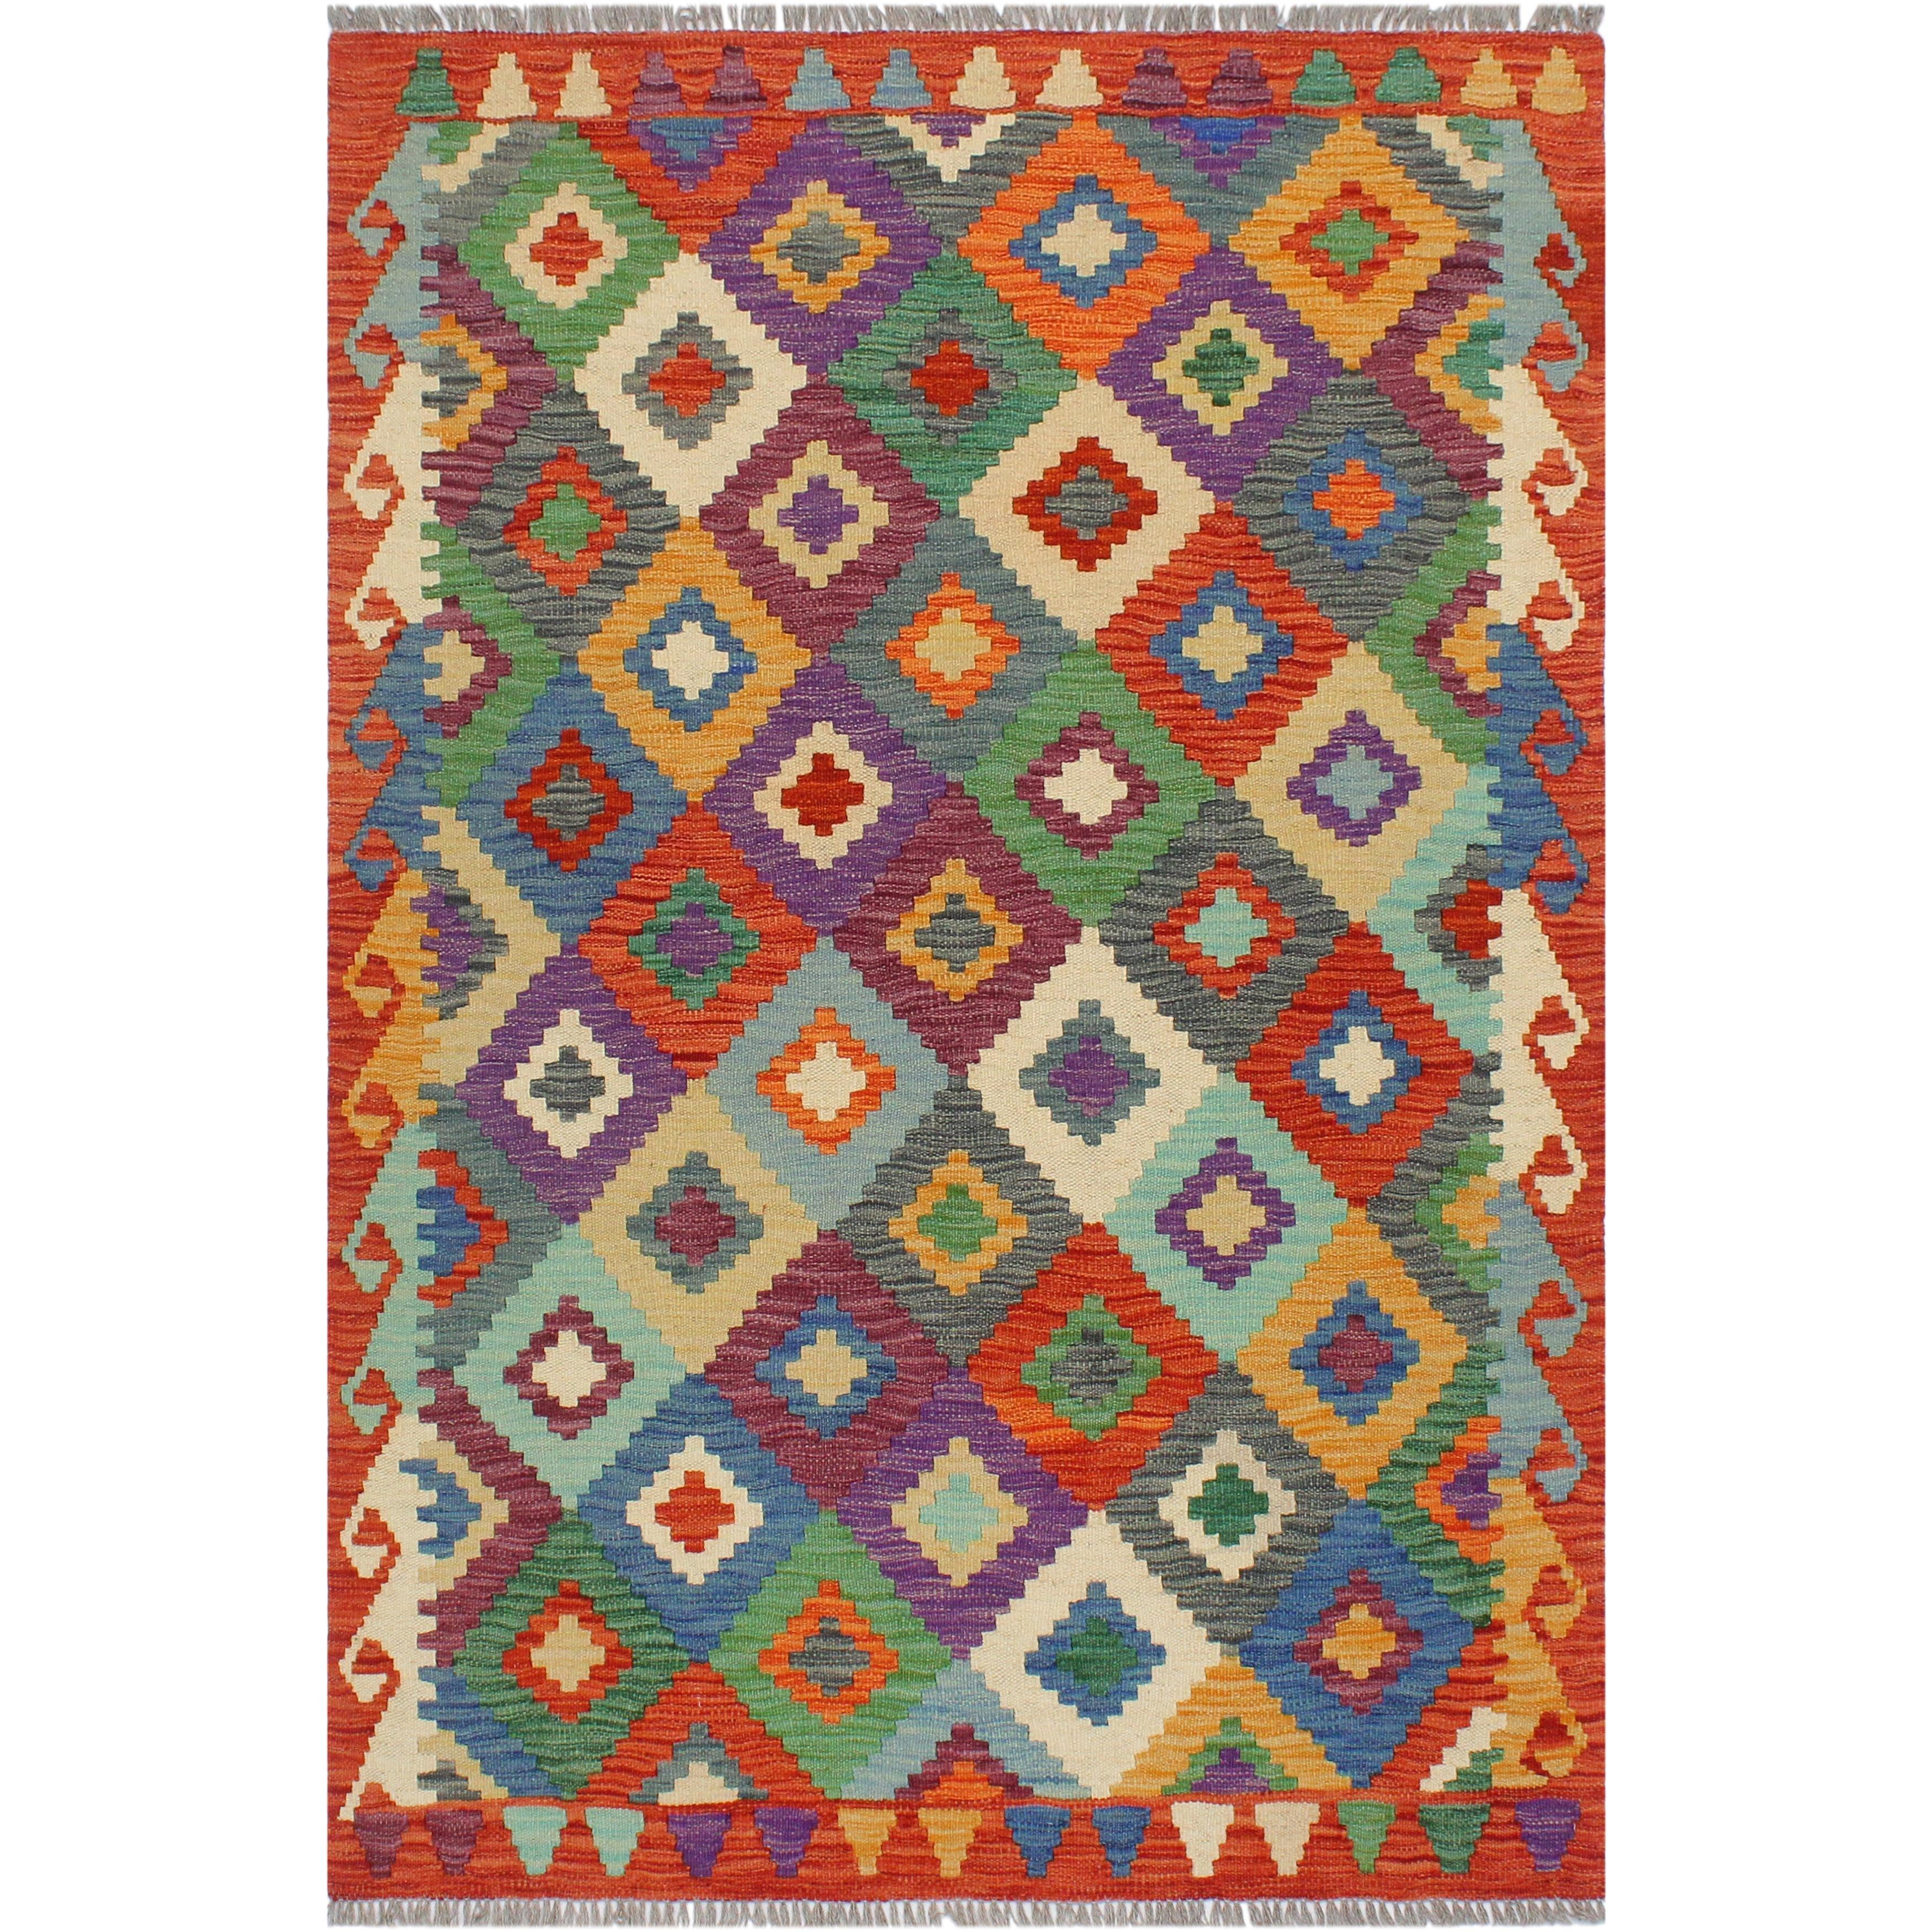 Bohemian Turkish Kilim Annamari Hand Woven Area Rug 3 4 X 4 9 Overstock 32540818